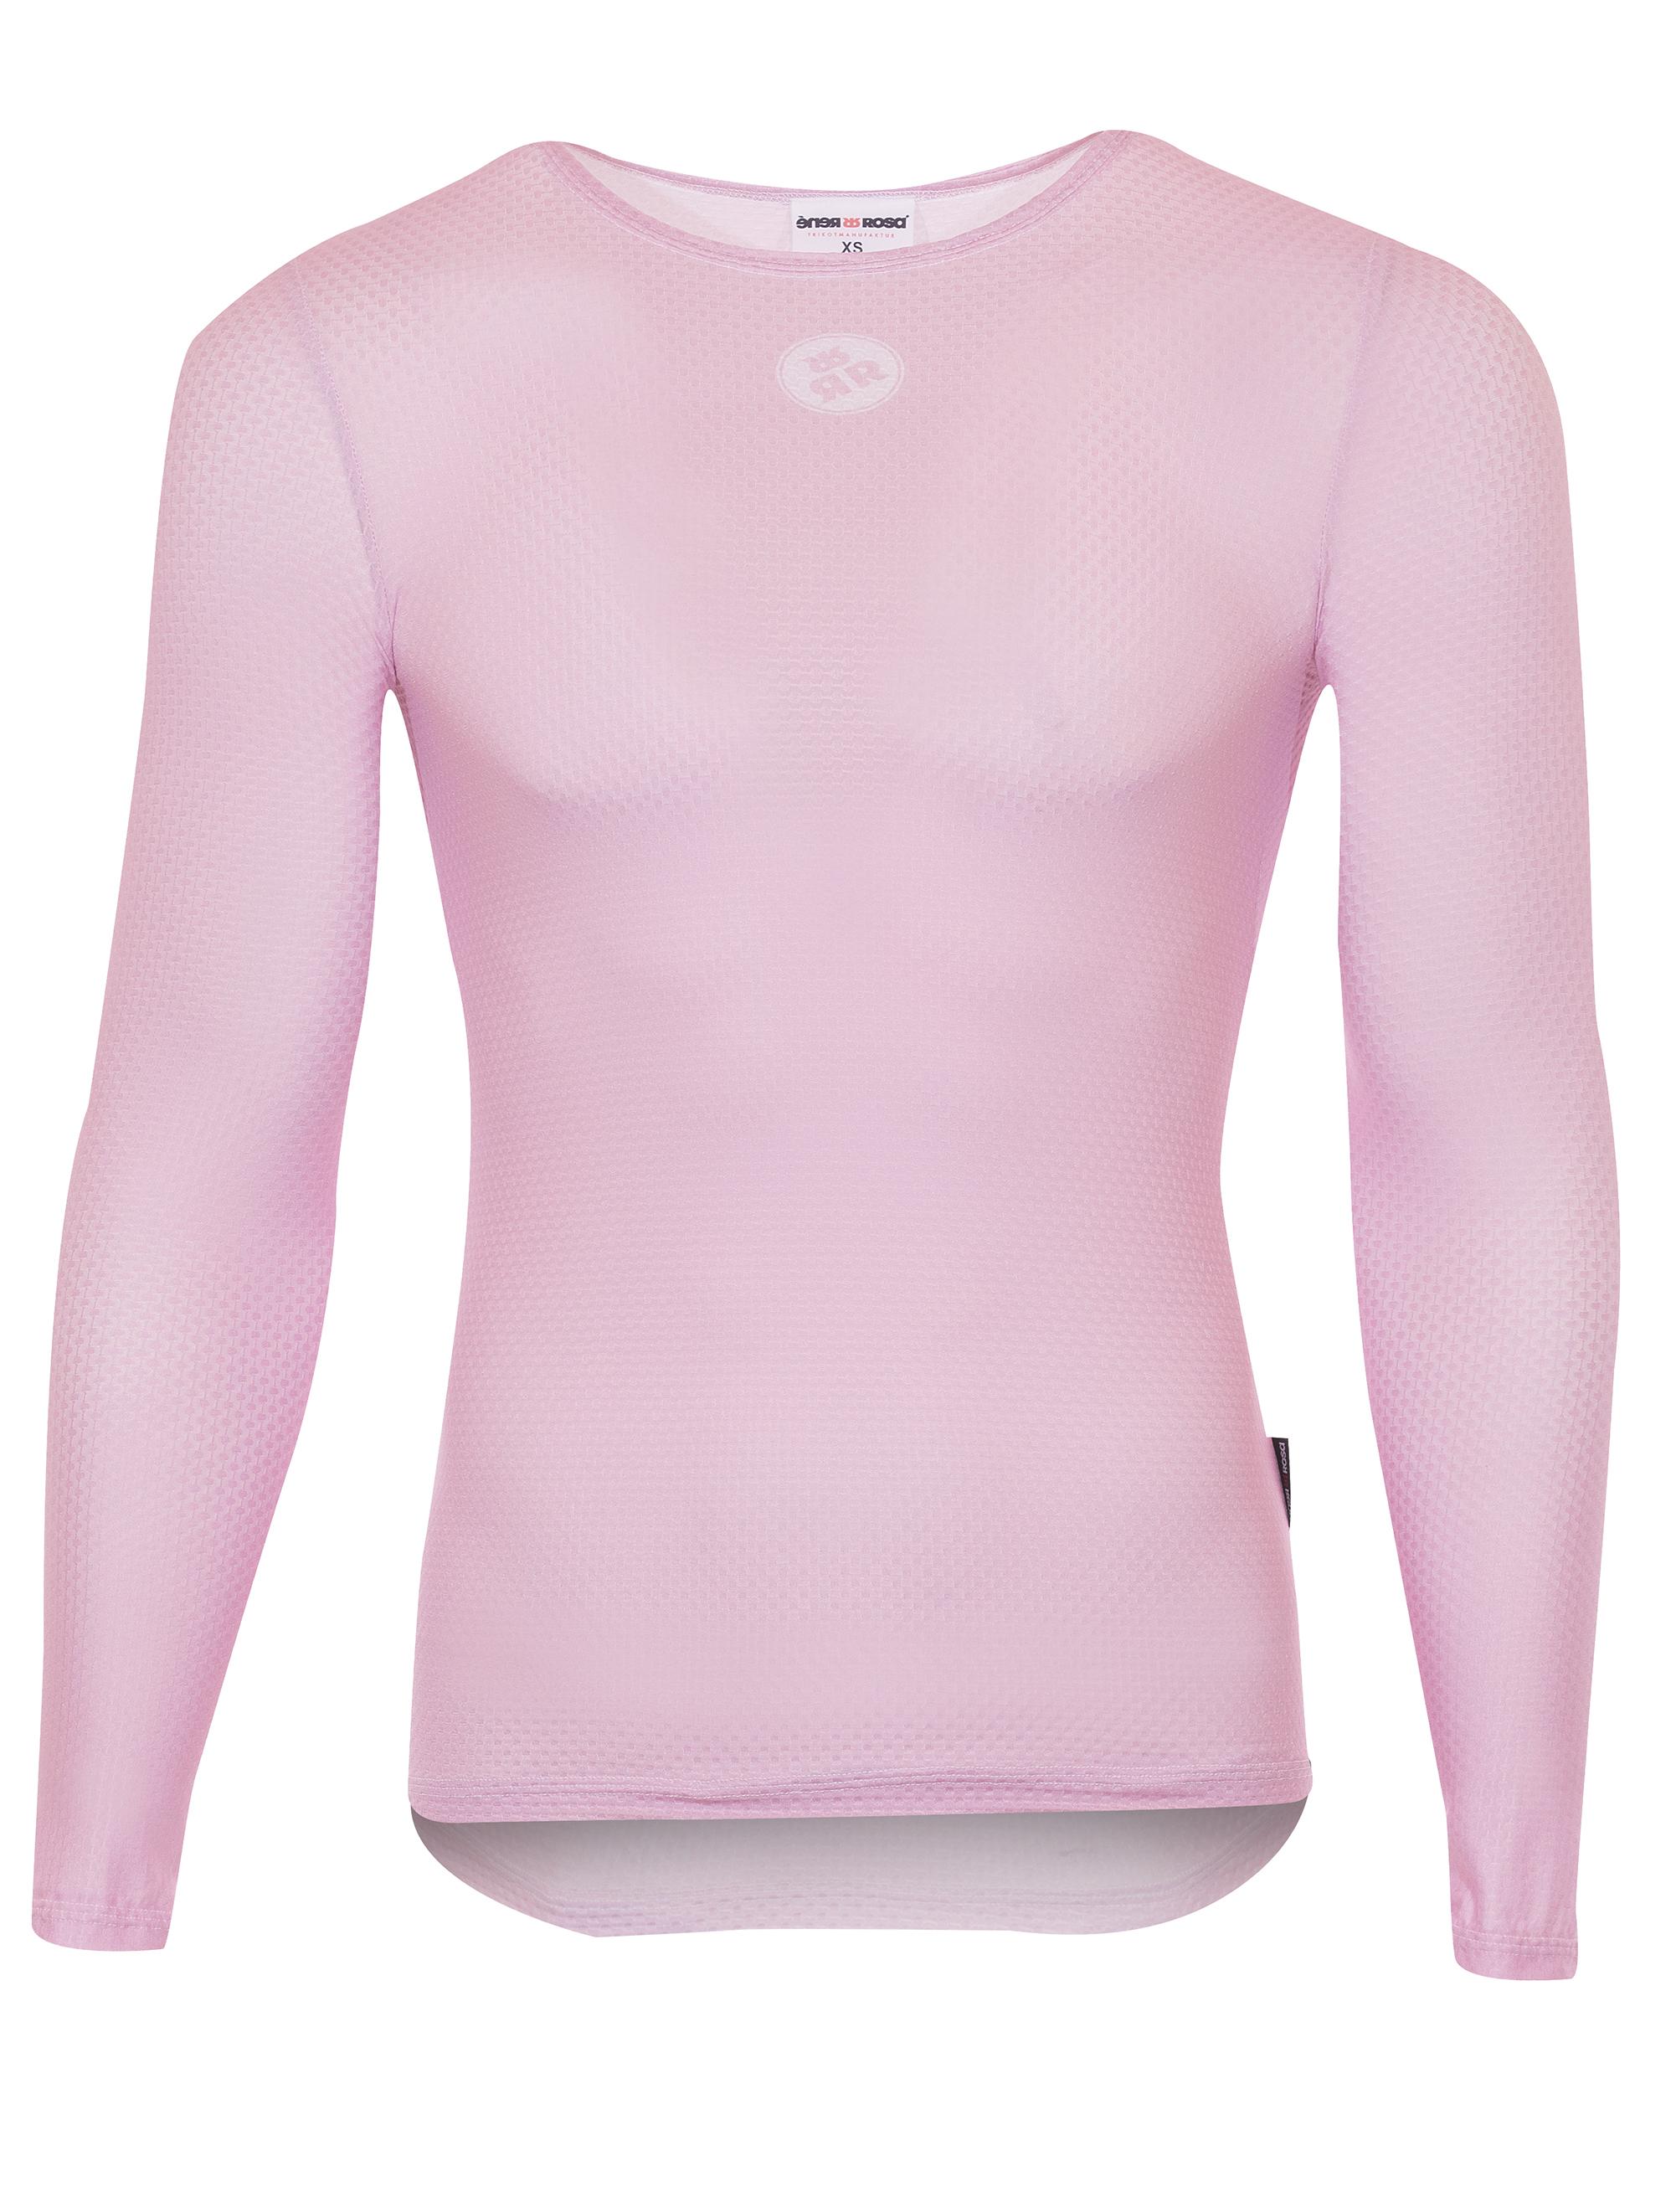 Unterhemd Langarm in Wunschfarbe / RRT816M